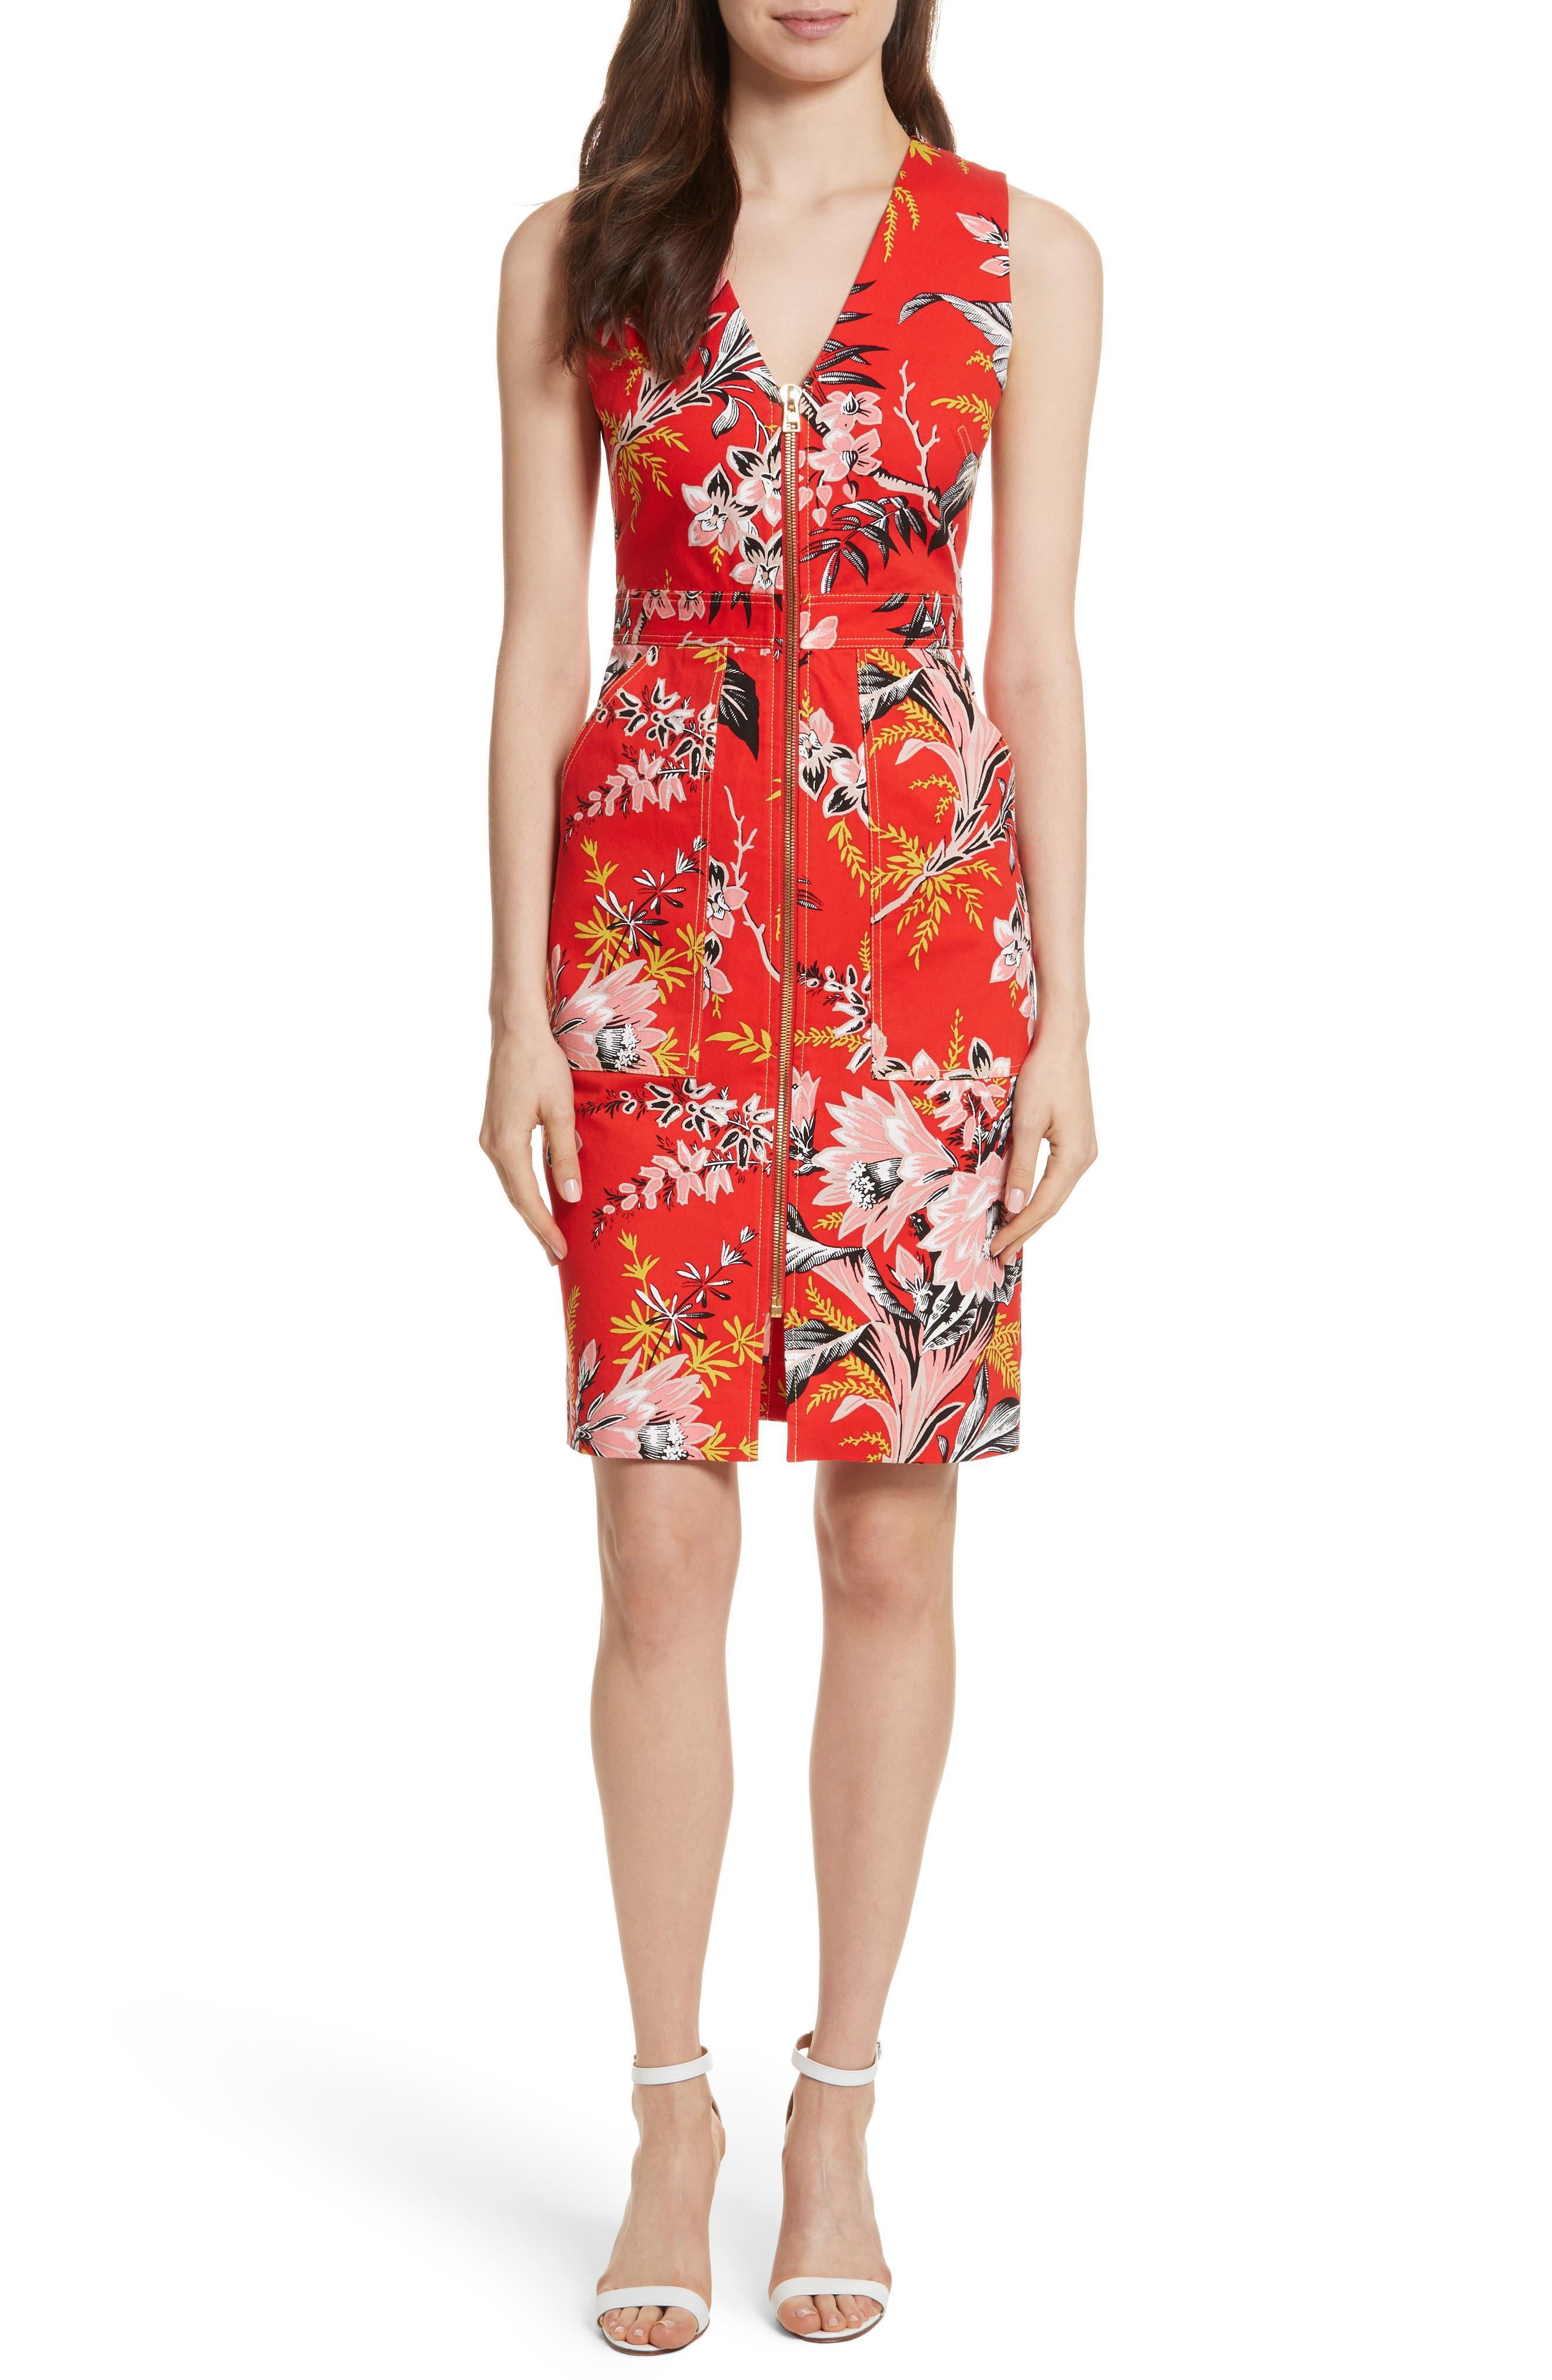 Diane von Furstenberg Floral Zip Front Stretch Cotton Sheath Dress,                             Main thumbnail 1, color,                             Avalon Poppy